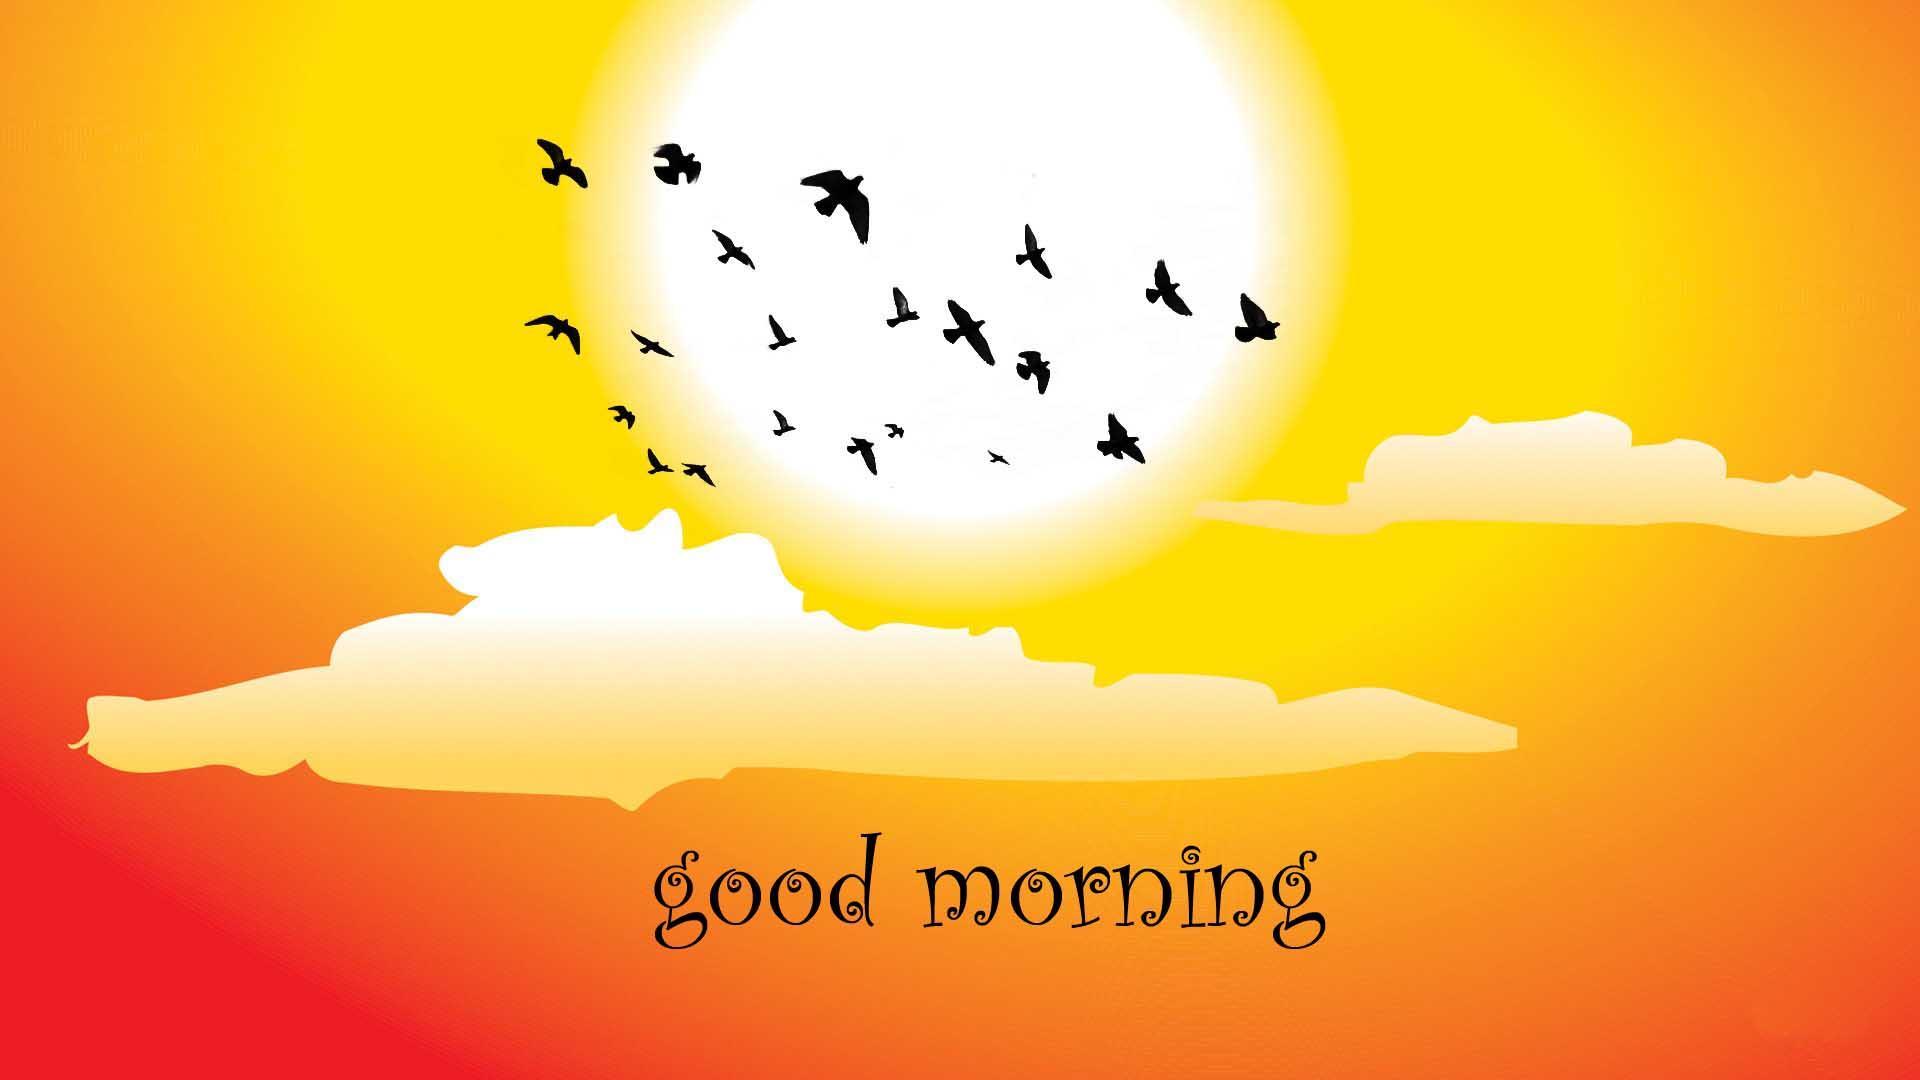 Good Morning Beautiful Pic Quotes : Good morning beautiful quotes sweet quotesgram